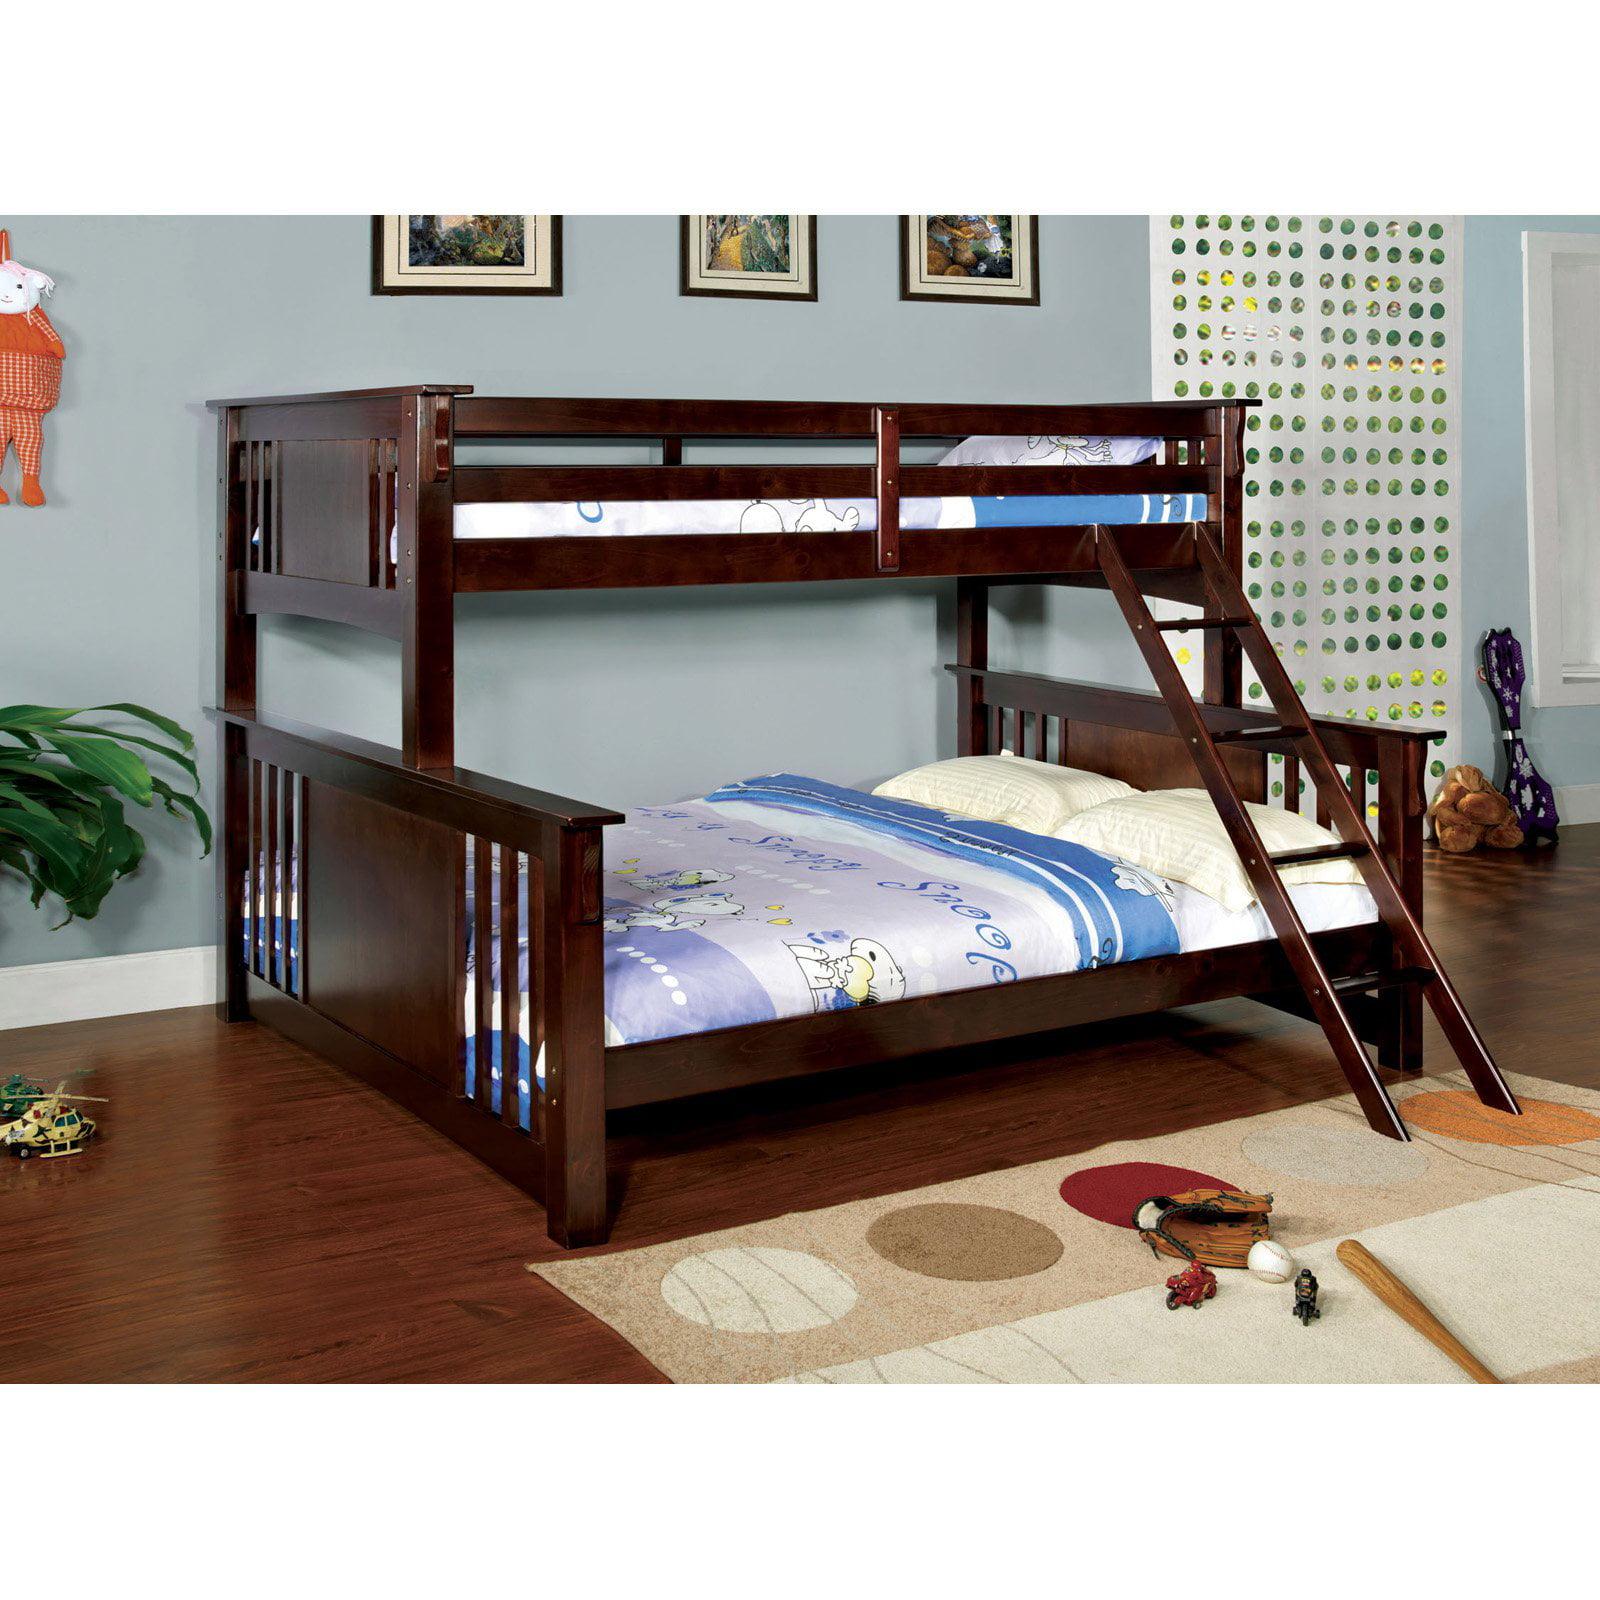 Furniture of America Spring Twin over Queen Bunk Bed - Dark Walnut